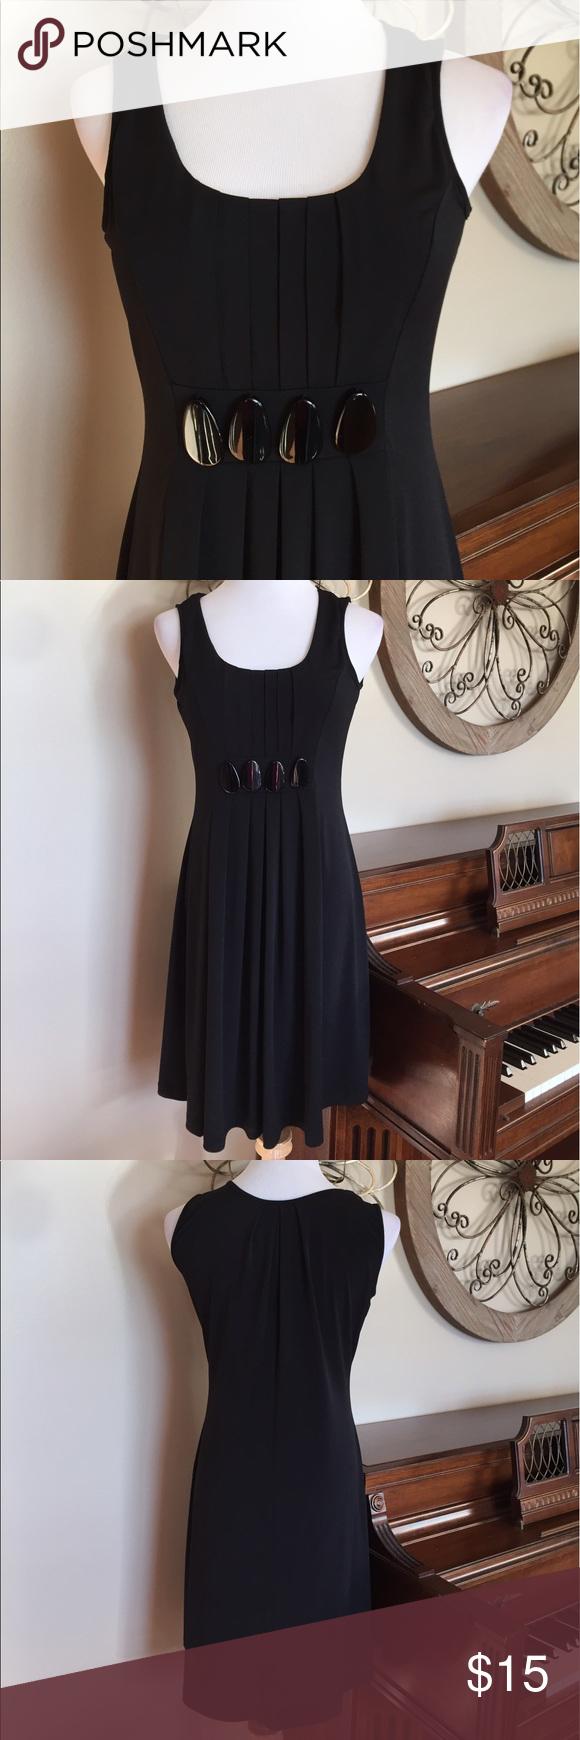 Black cocktail dresses size 10